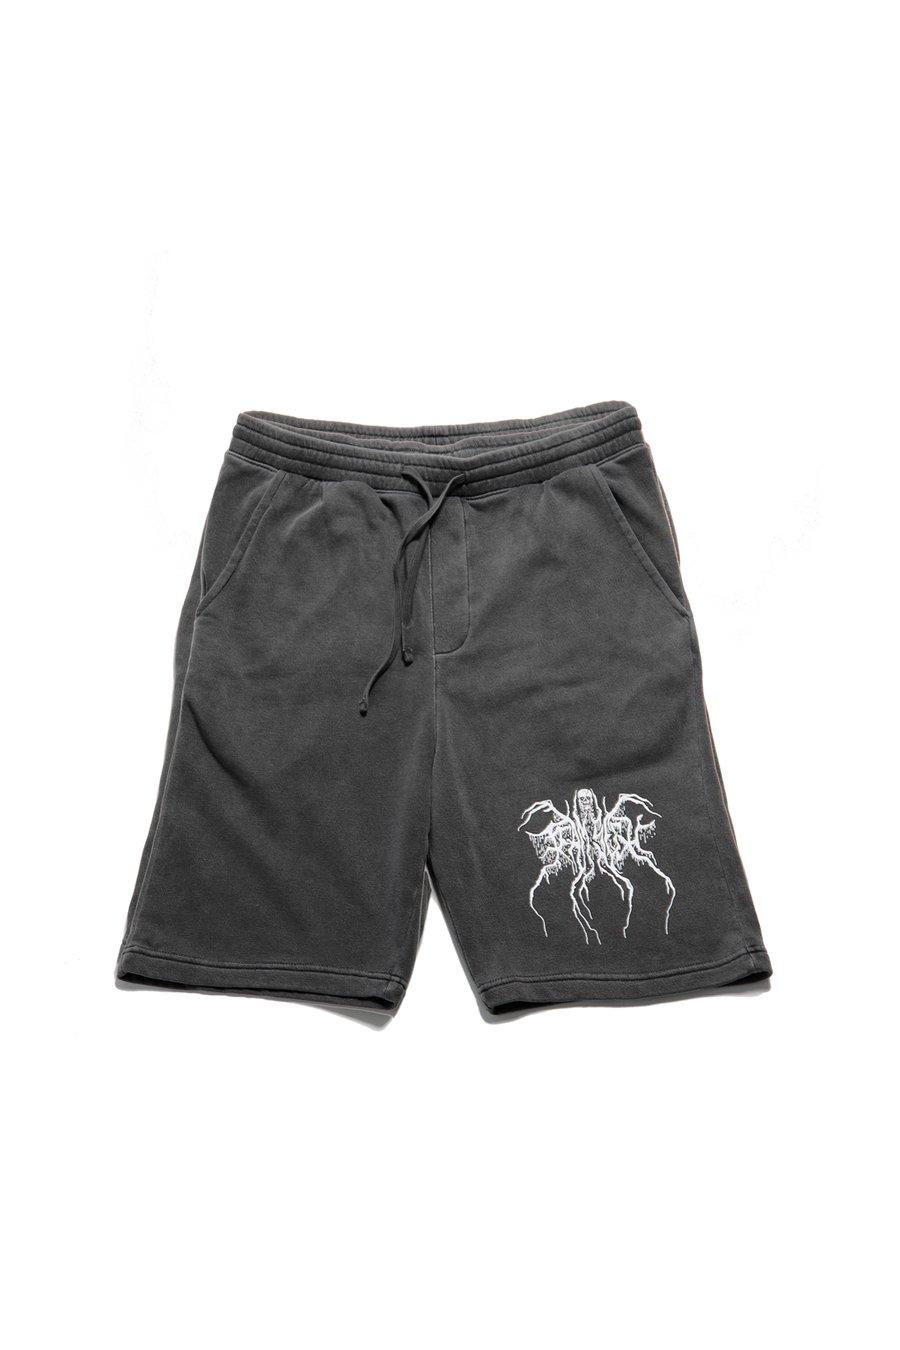 "Image of ""Deadthrone""  fleece shorts"